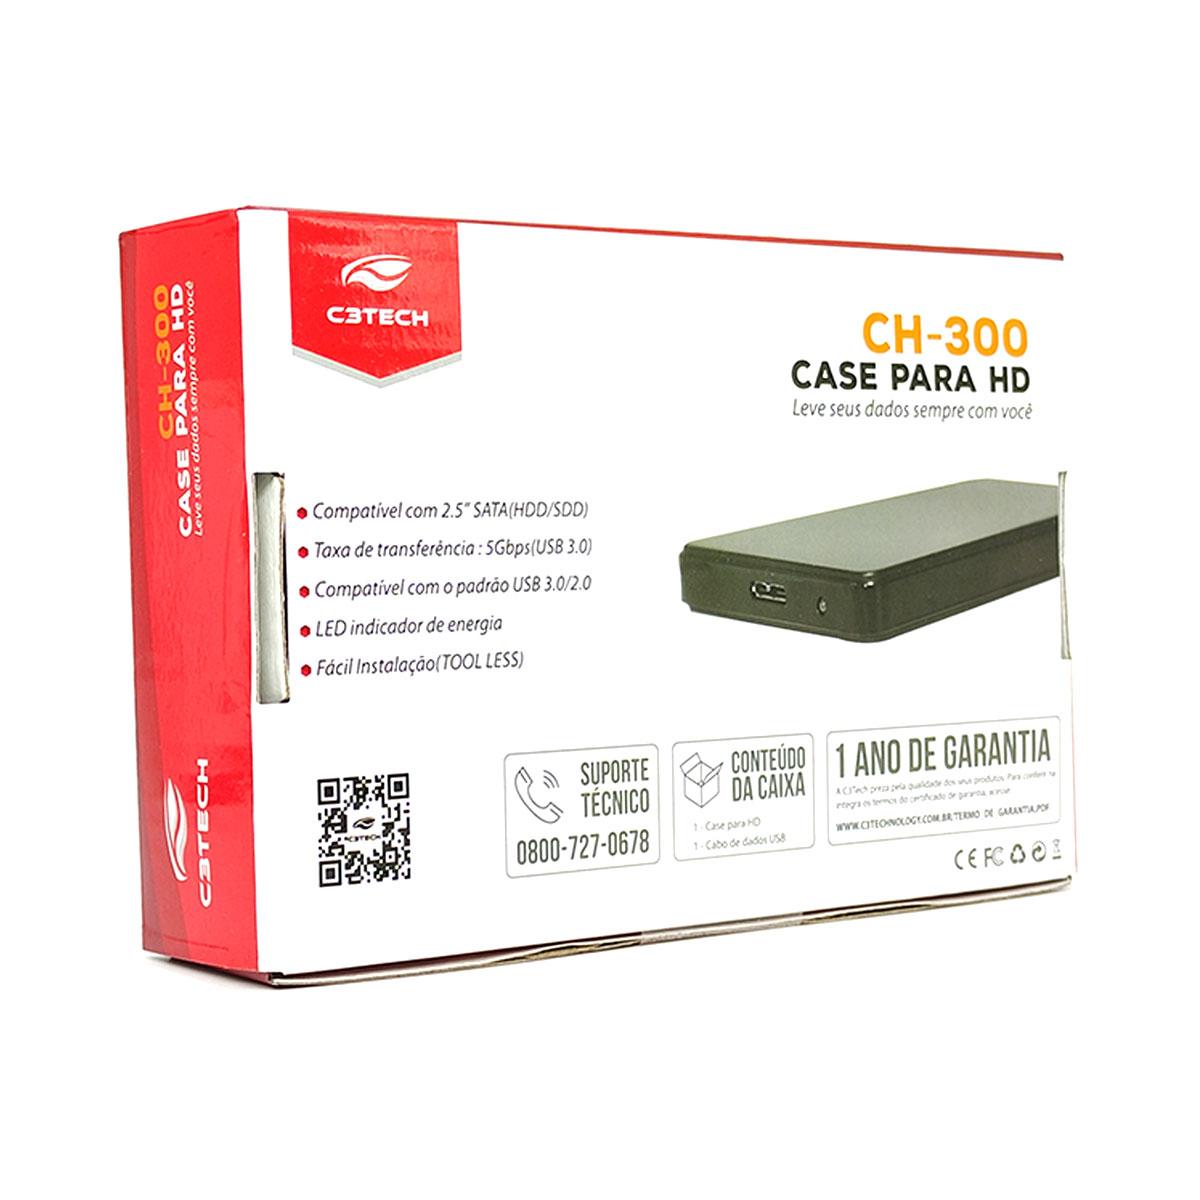 "Gaveta para HD Externo 2,5"" C3Tech CH-300BK, USB 3.0, Preto"